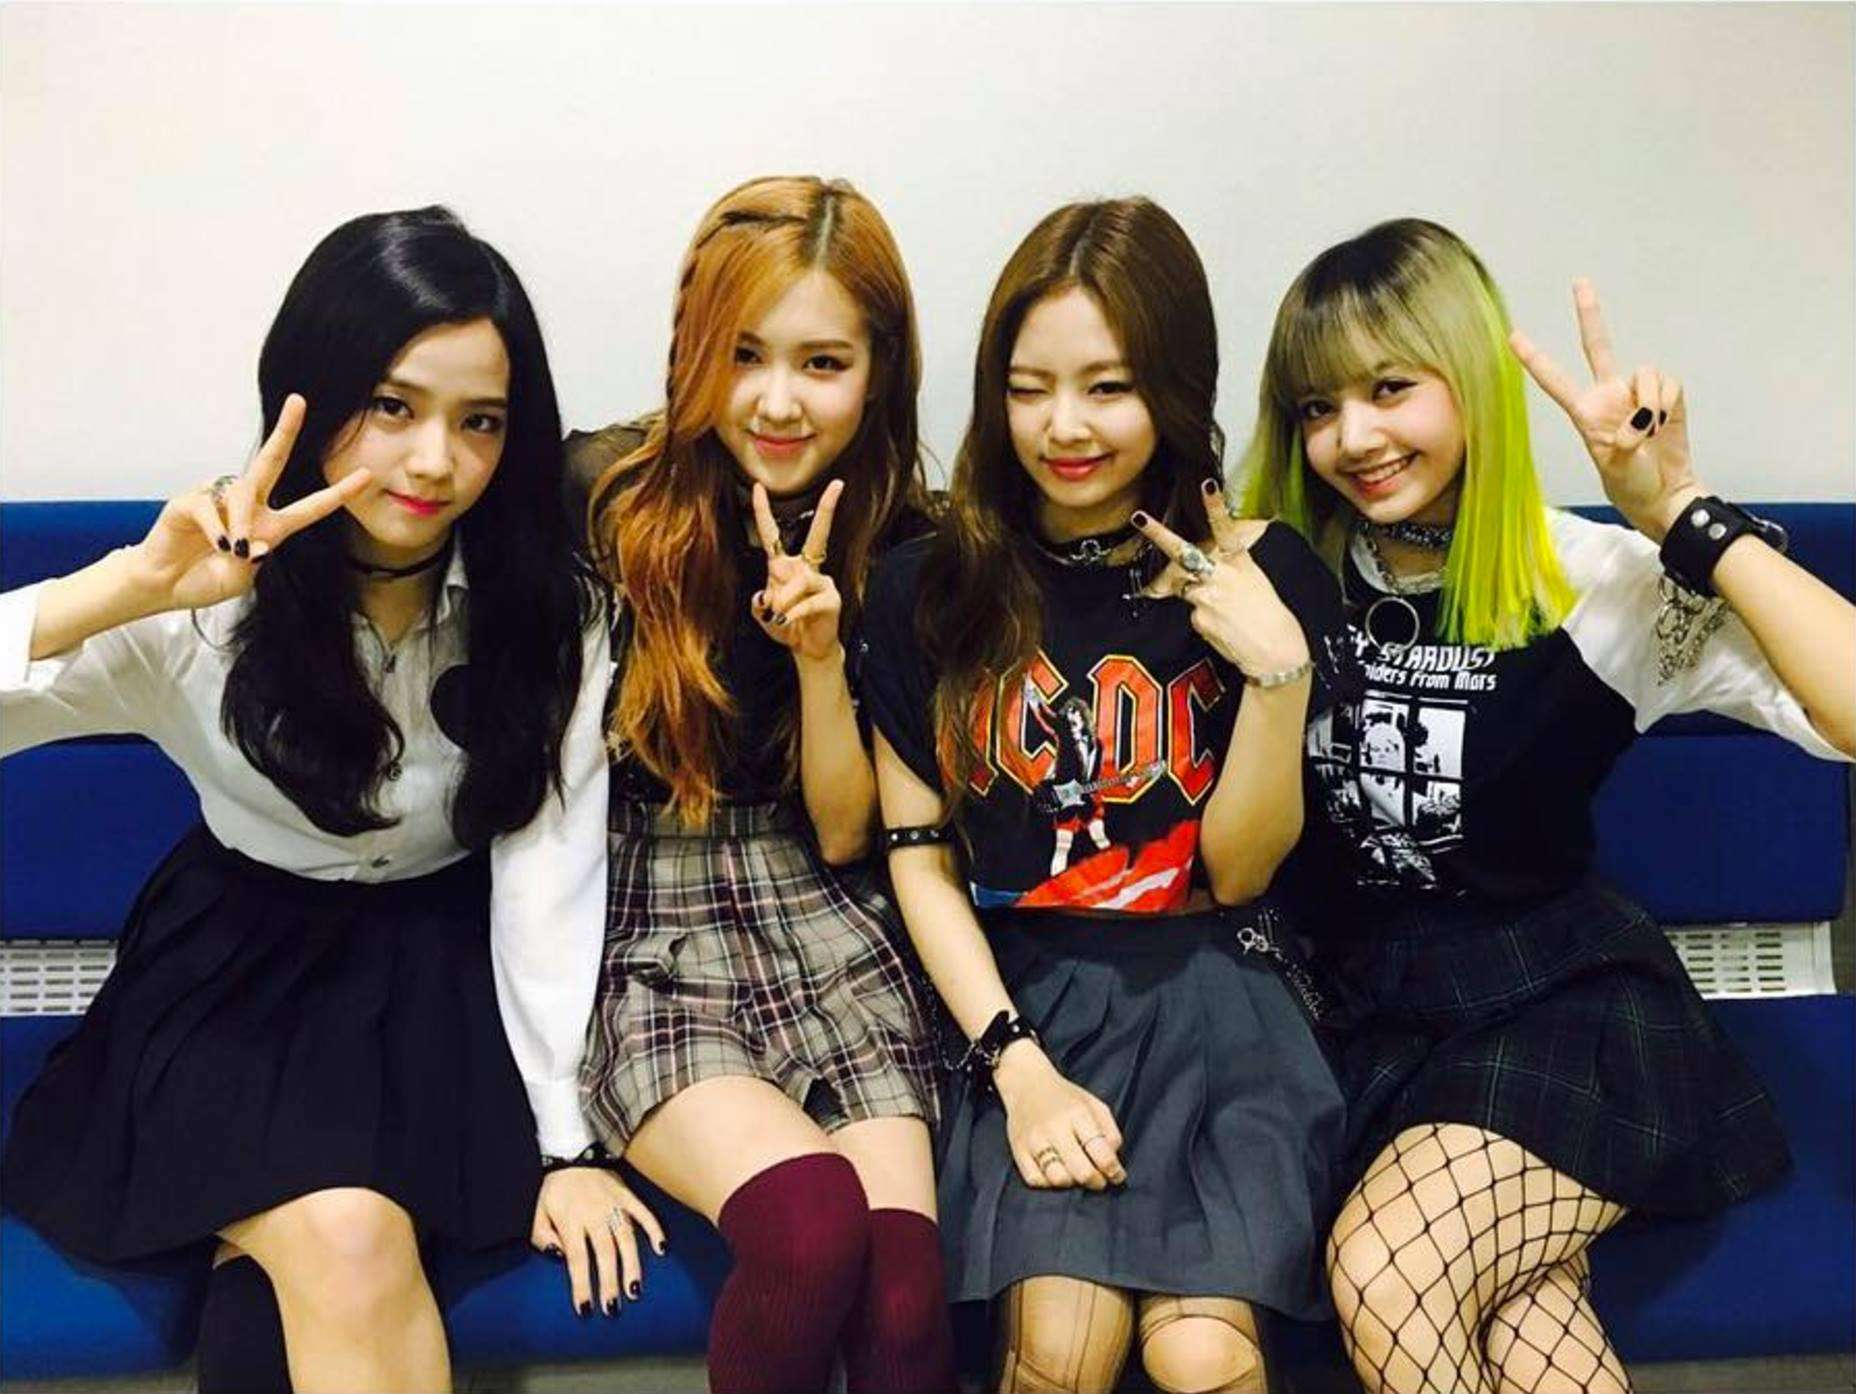 FB粉絲數 GFRIEND 25萬 MAMAMOO 55萬 Red Velvet 69萬 TWICE 125萬 IOI         10萬 BLACK PINK  60萬